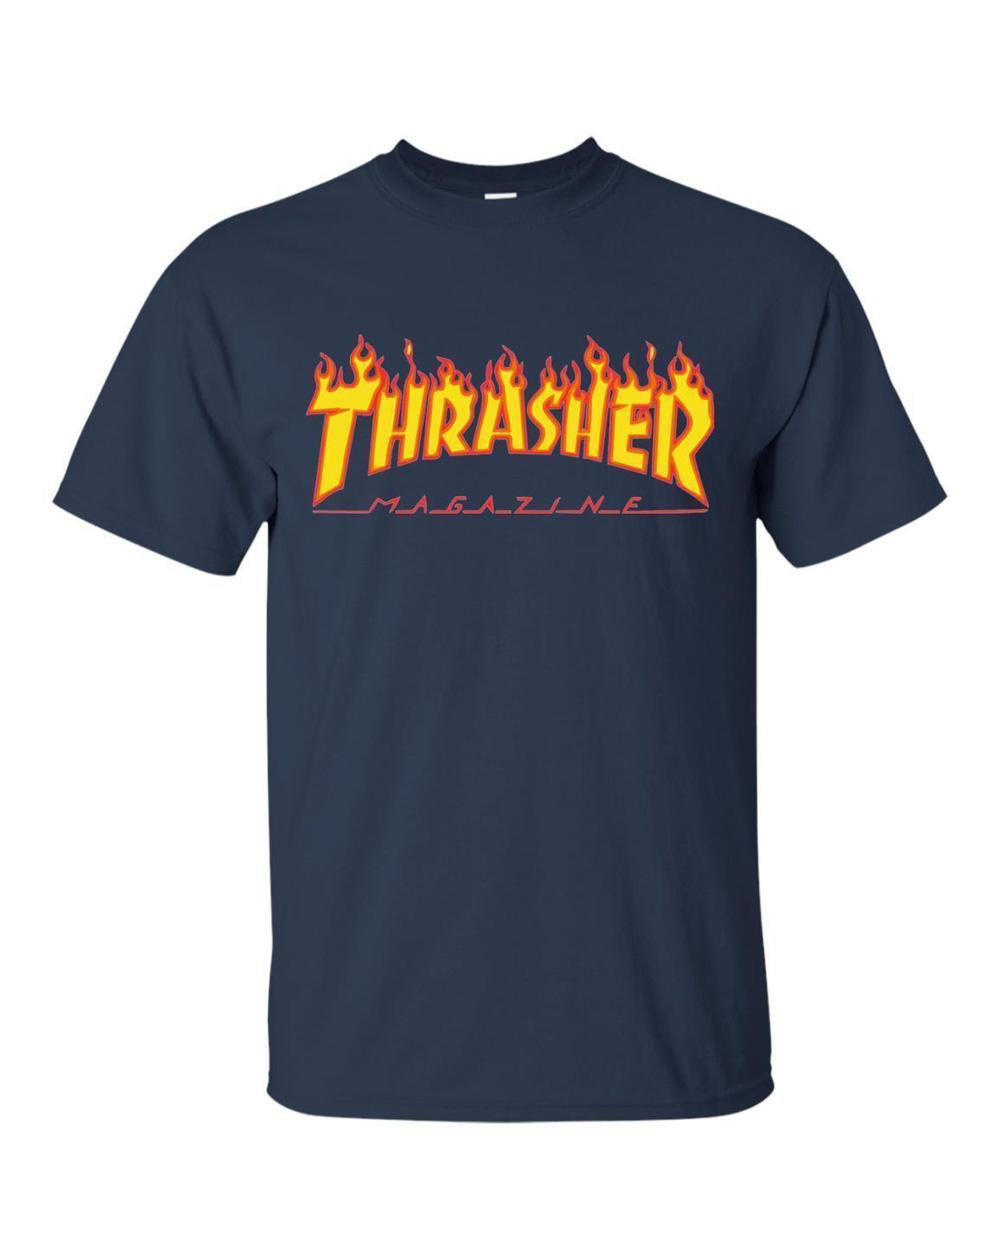 Thrasher Men's T-Shirt Flame Navy